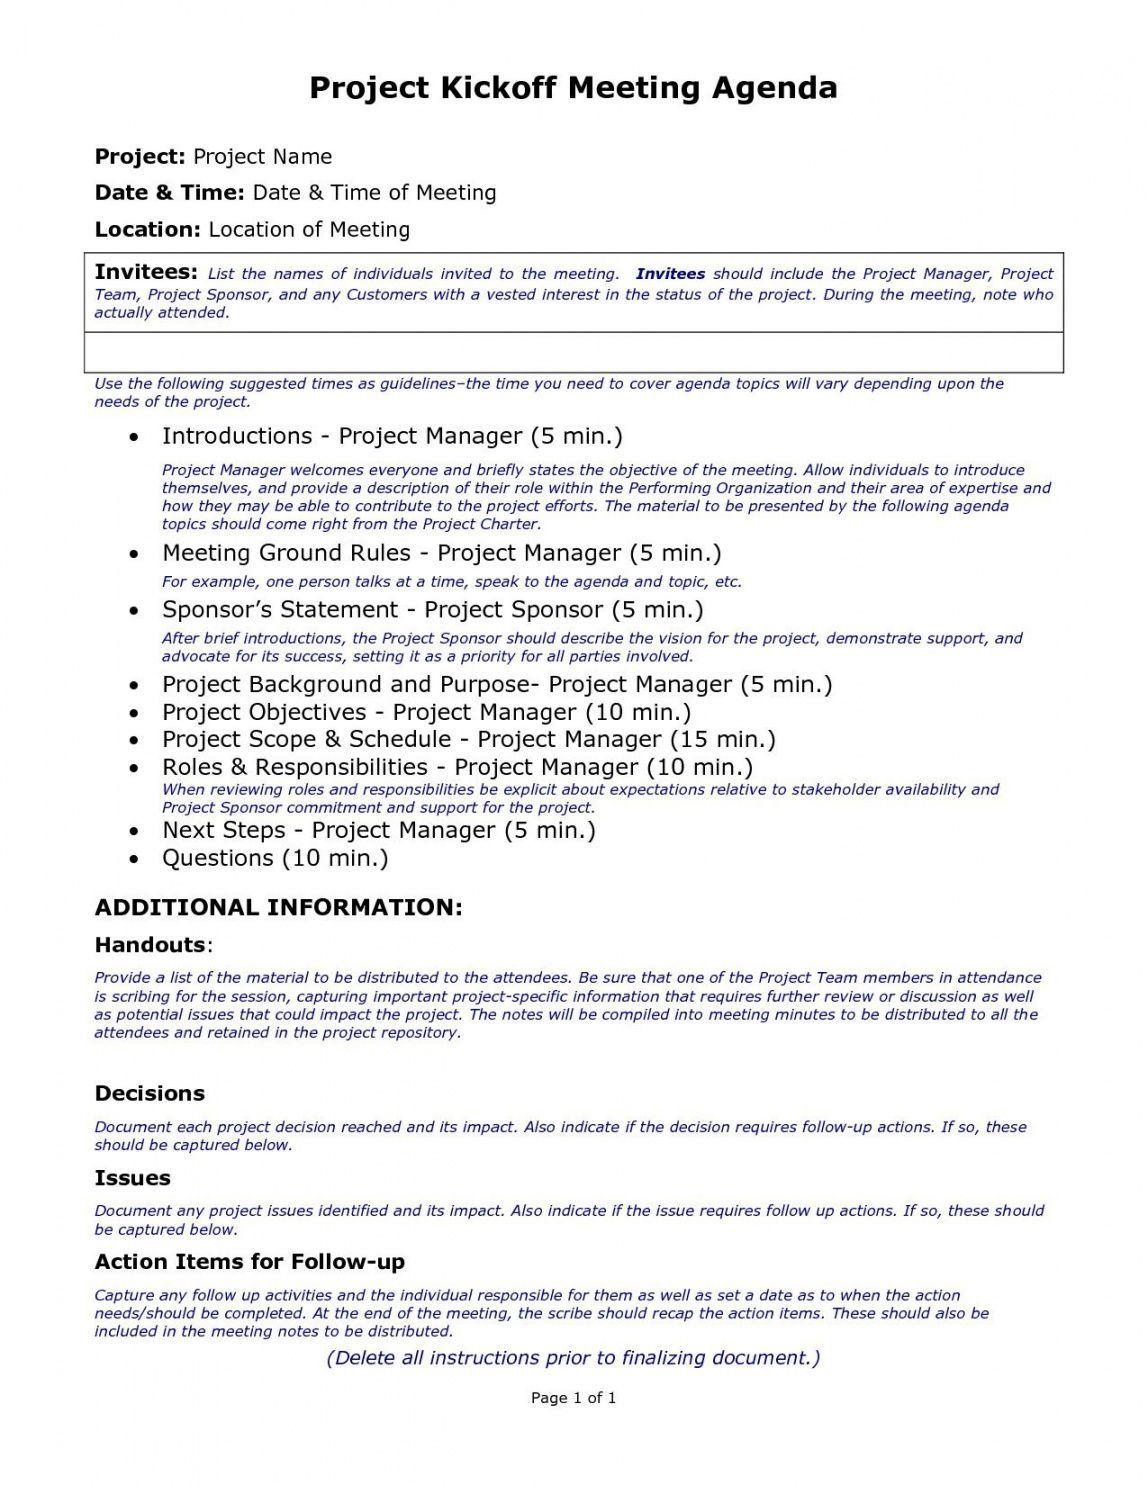 Project Management Kick Off Meeting Agenda Template In 2021 Meeting Agenda Template Meeting Agenda Kickoff Meeting Project management meeting agenda template